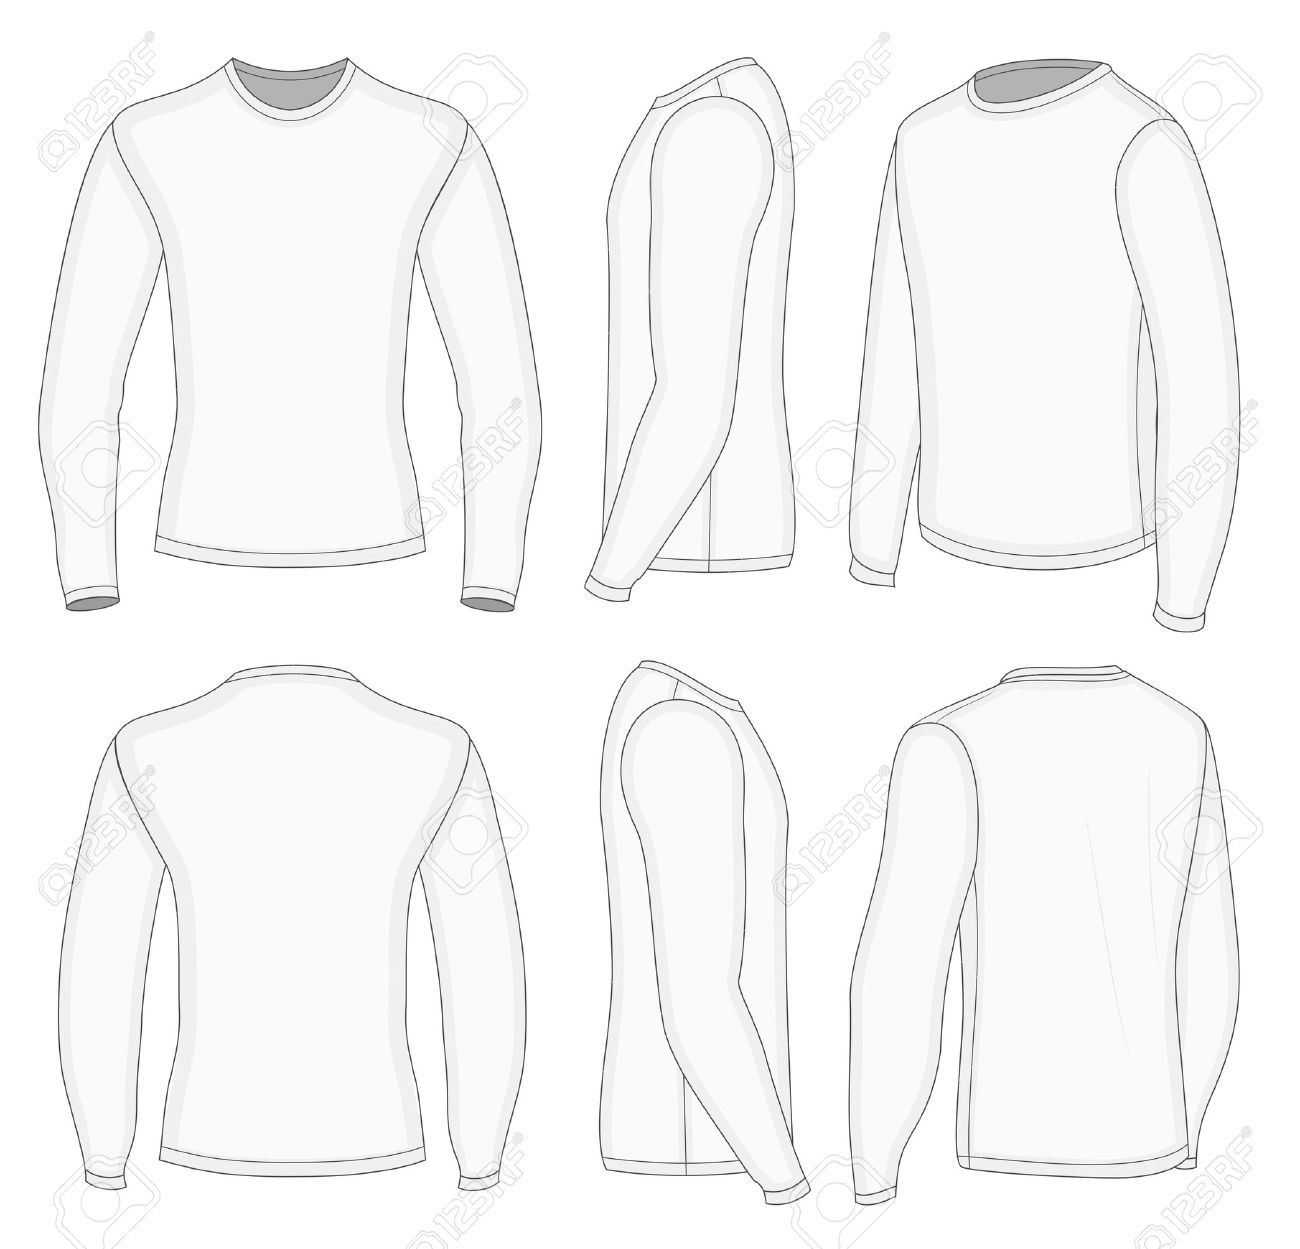 Download All Six Views Mens White Long Sleeve T Shirt Design Templates Style Shirt 2015 T Shirt Design Template Polo Shirt Design Mens Flight Jacket